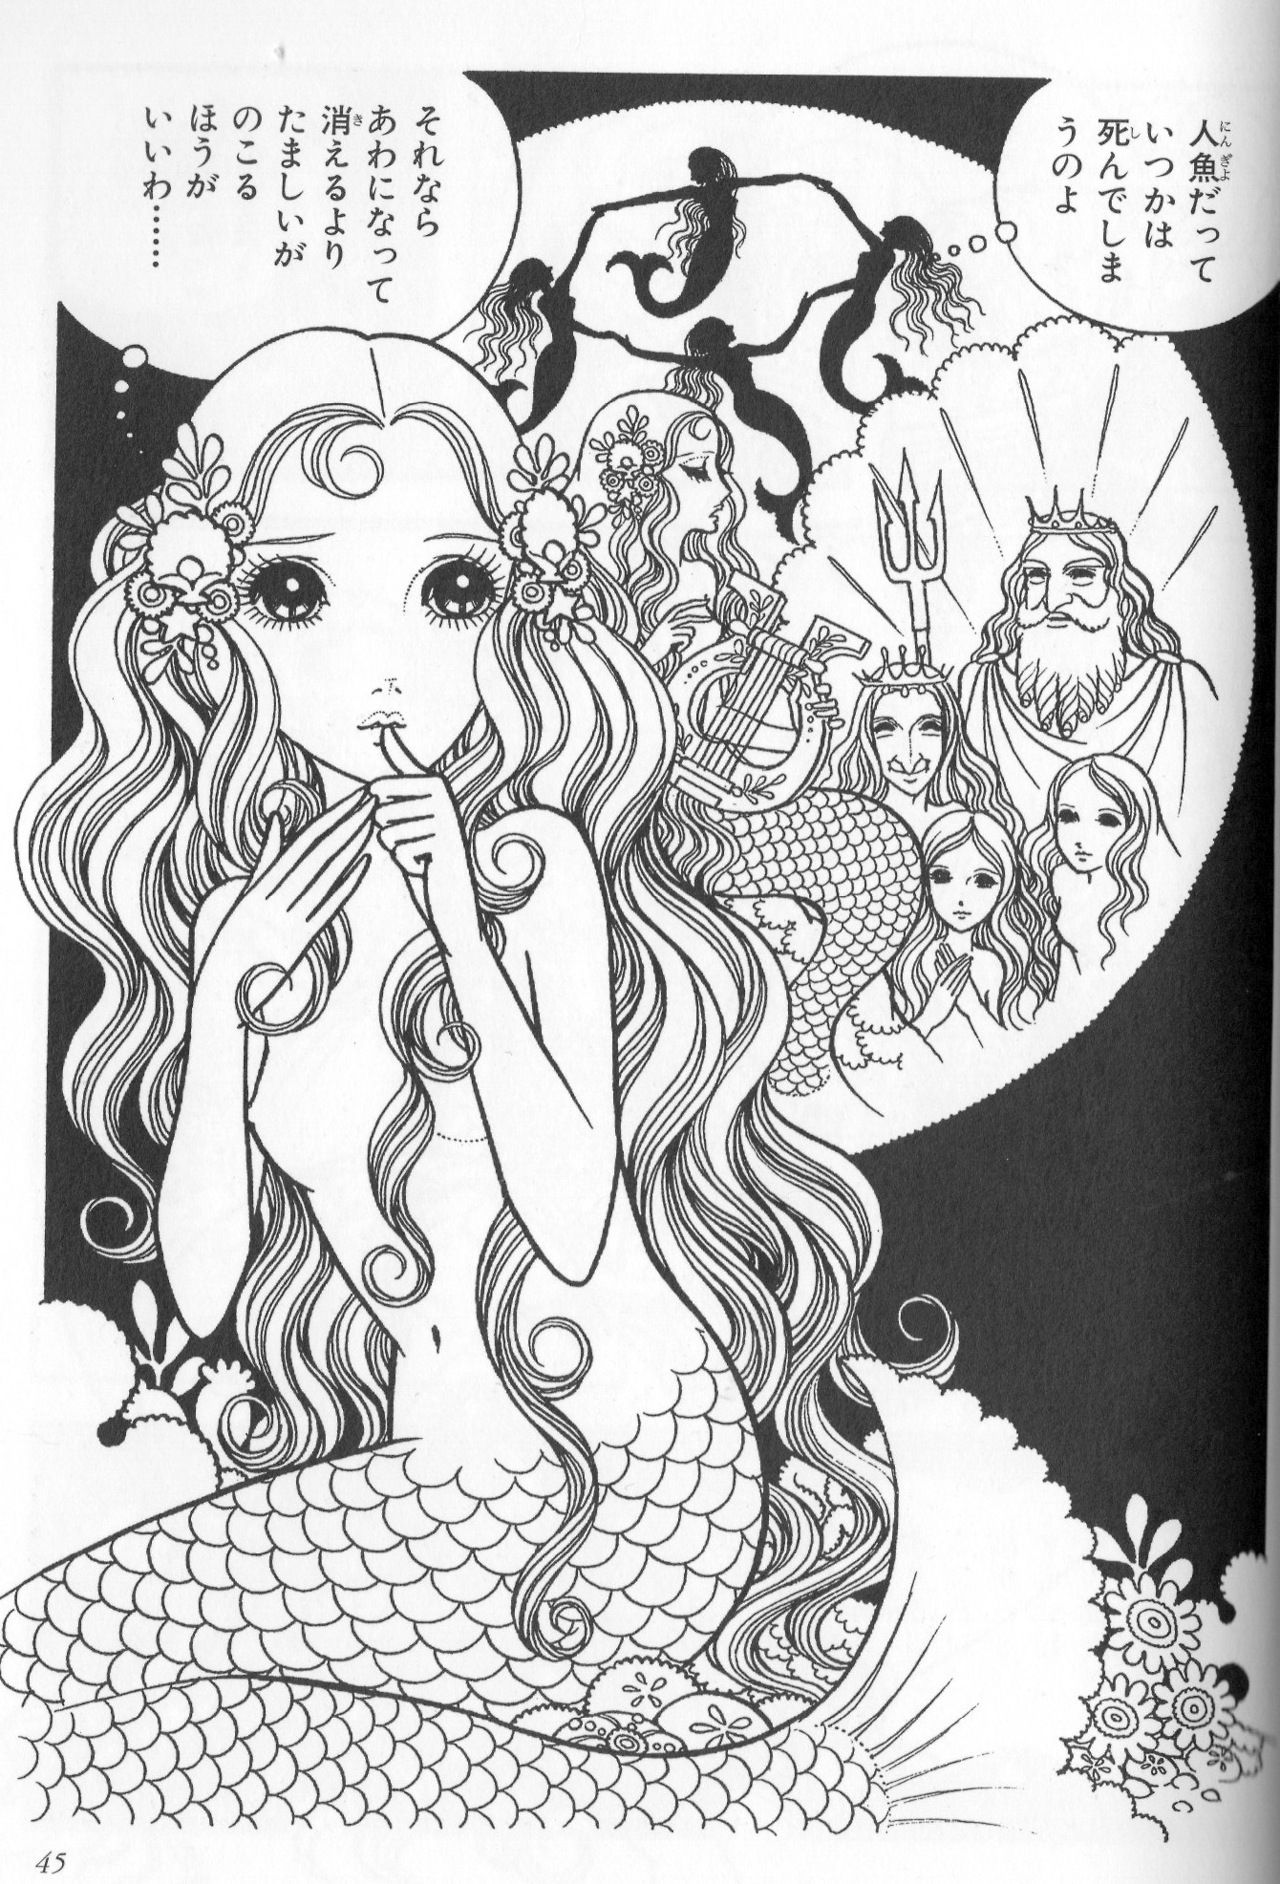 takahashi macoto � the little mermaid vintage manga in